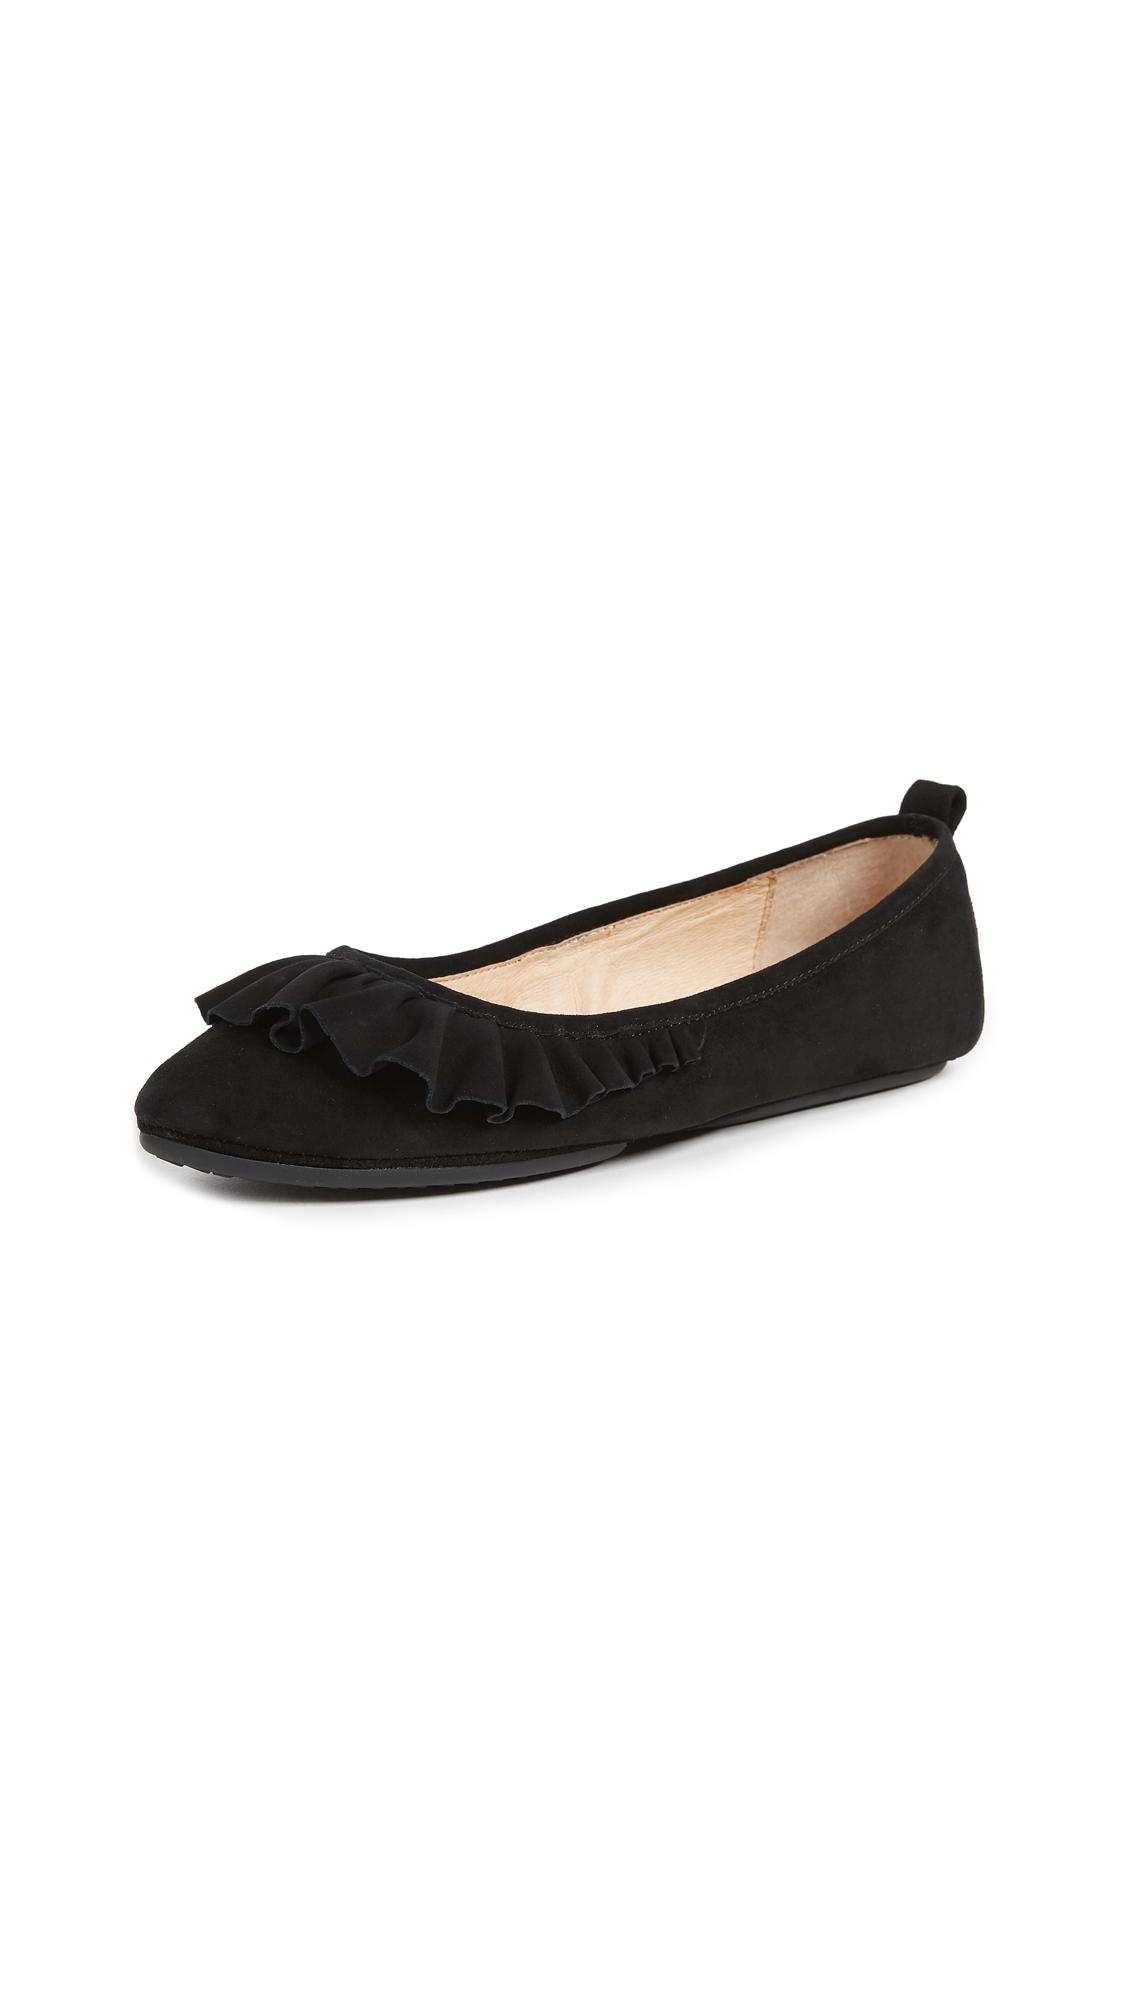 Yosi Samra Vanessa Ballet Flats - Black